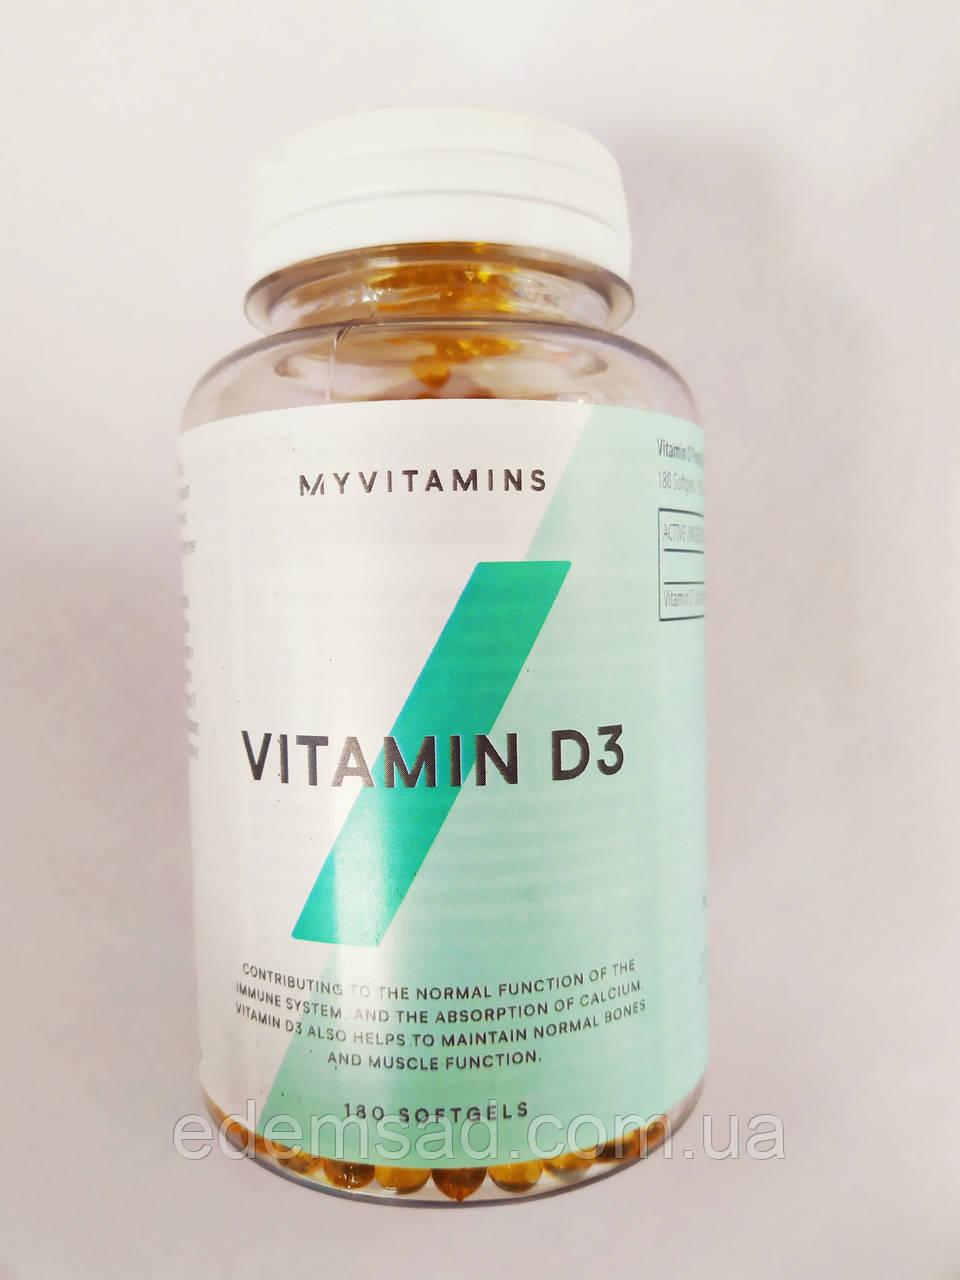 Вітамін D3 Myprotein MyVitamins Vitamin D3 180caps